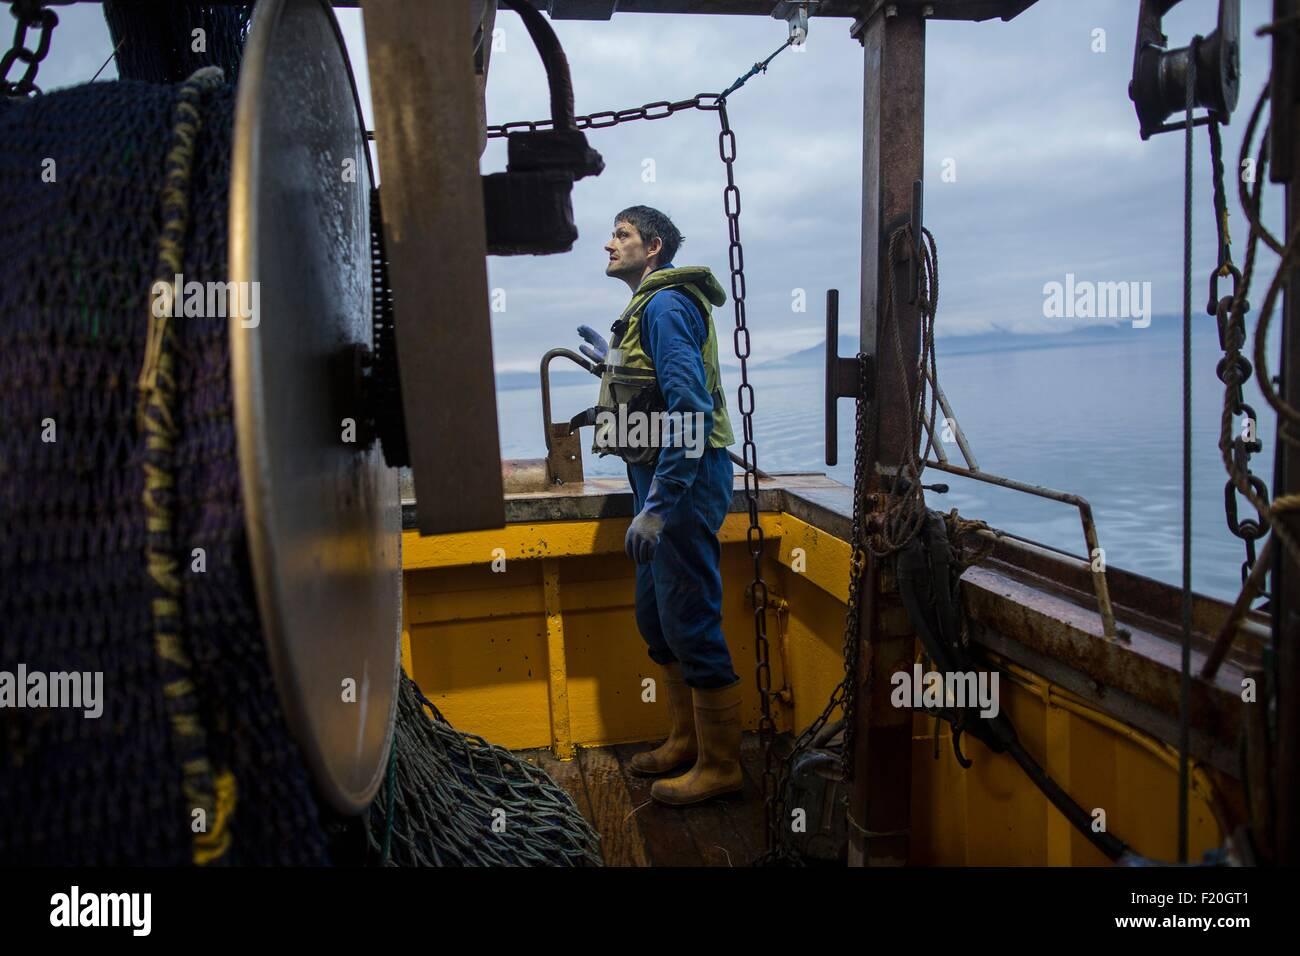 Fisherman preparing trawler - Stock Image